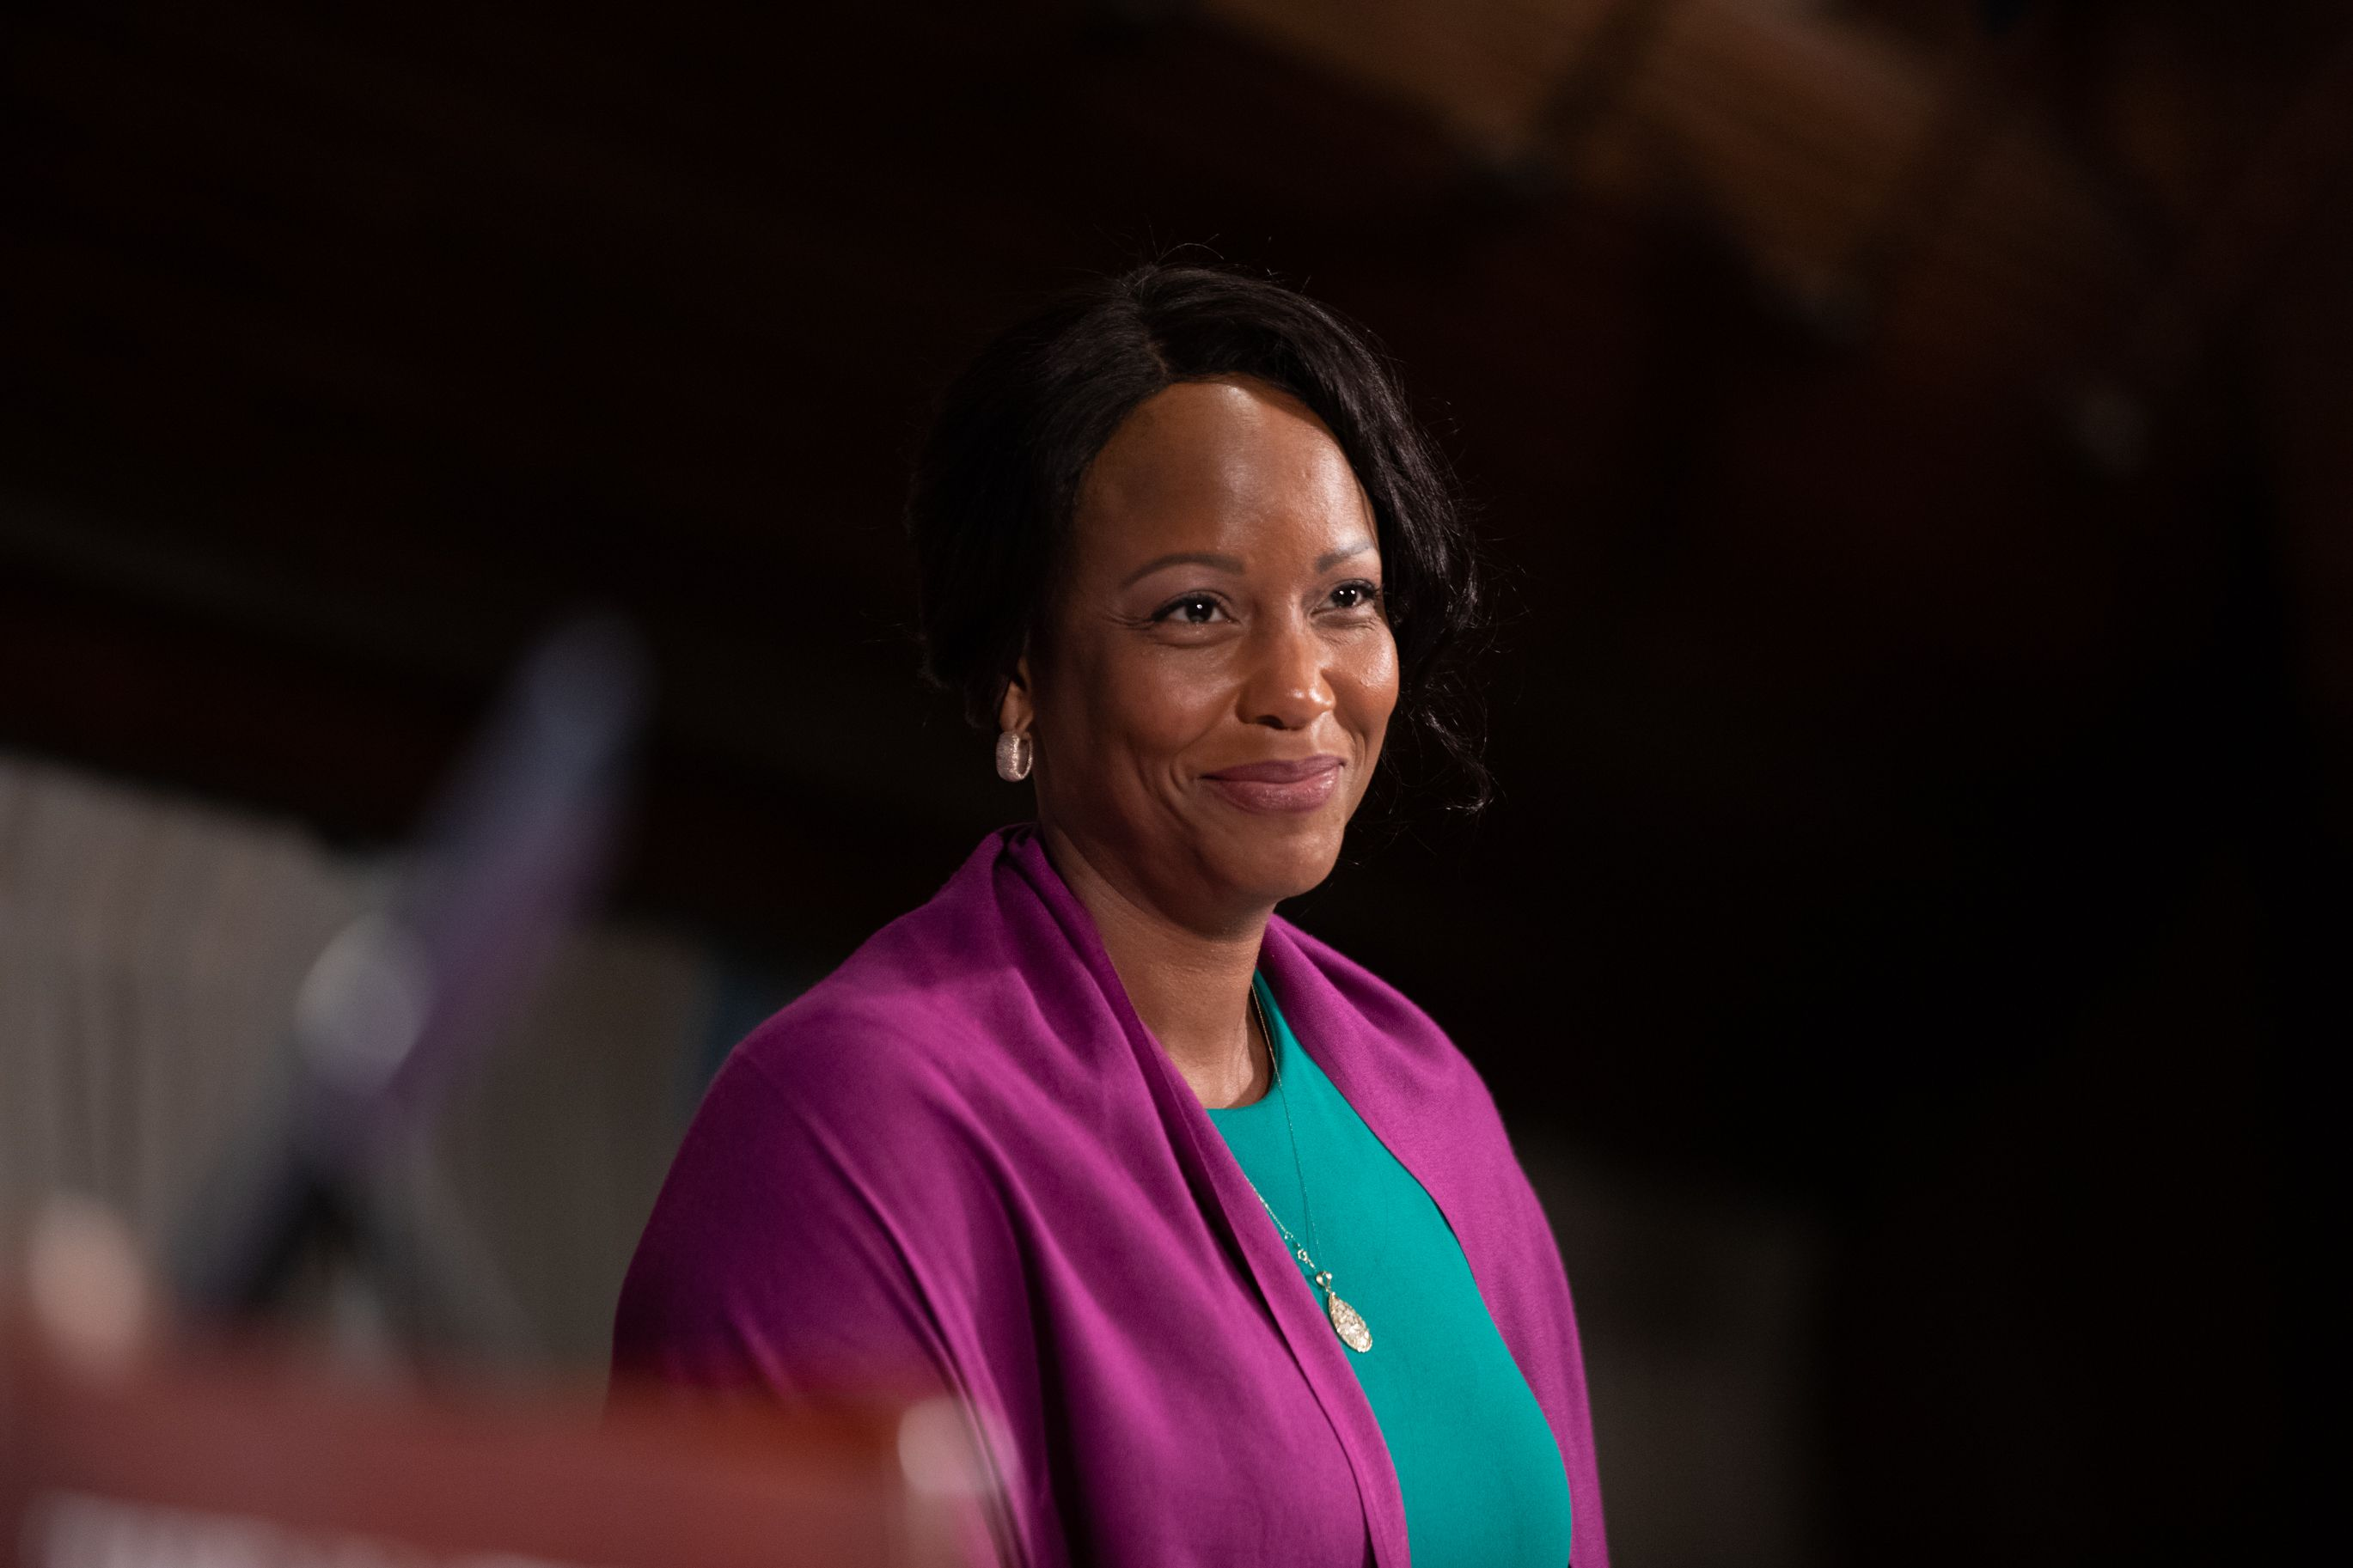 Maya Rockeymoore Cummings, Elijah Cummings's Widow, Is Running for Congress